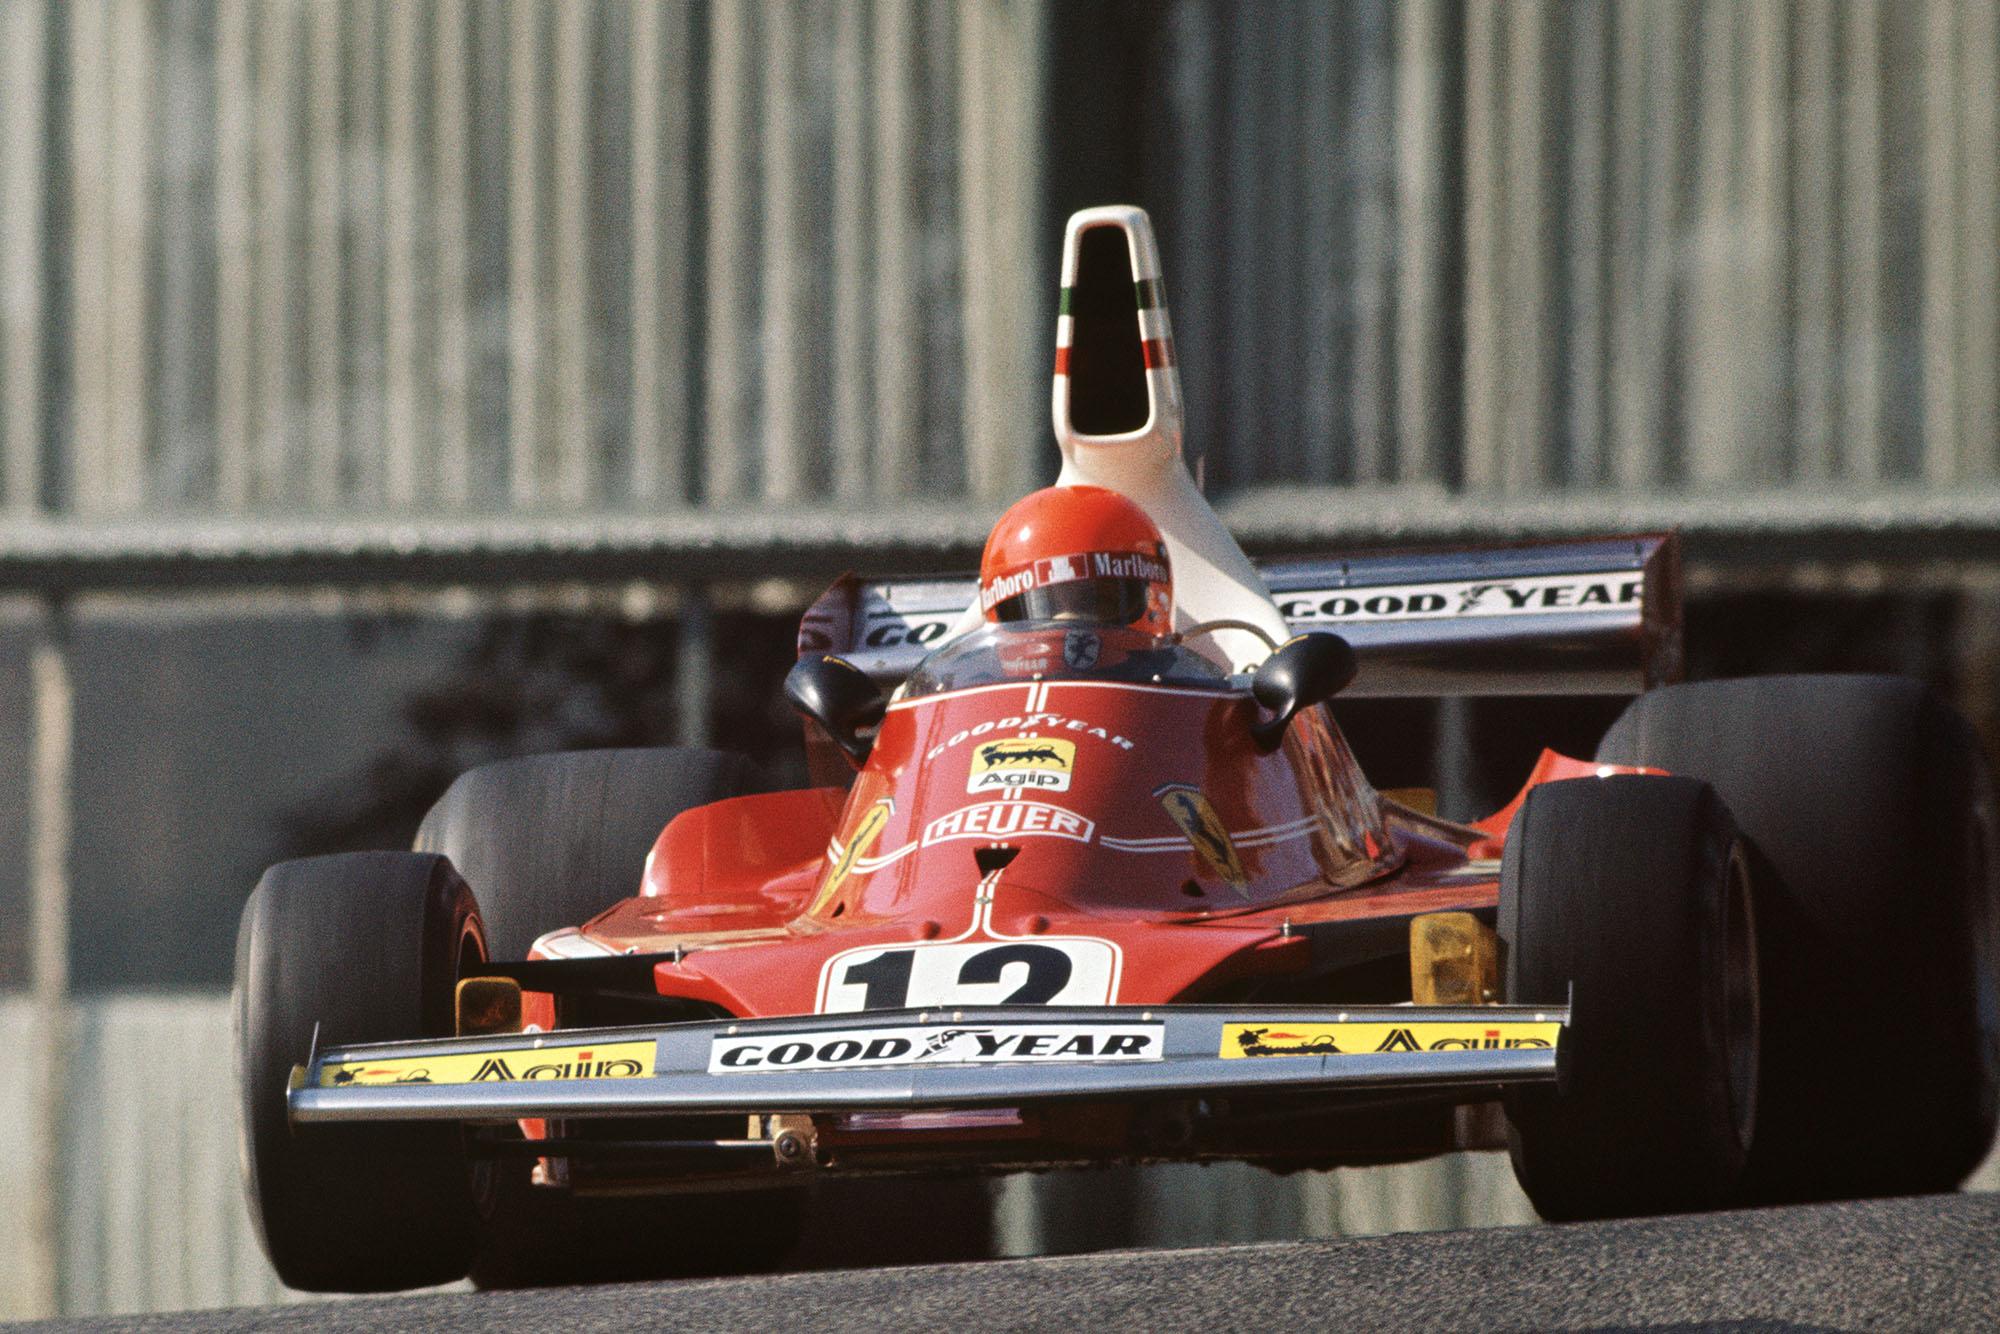 Niki Lauda's Ferrari jumps through Casino at the 1975 Monaco Grand Prix